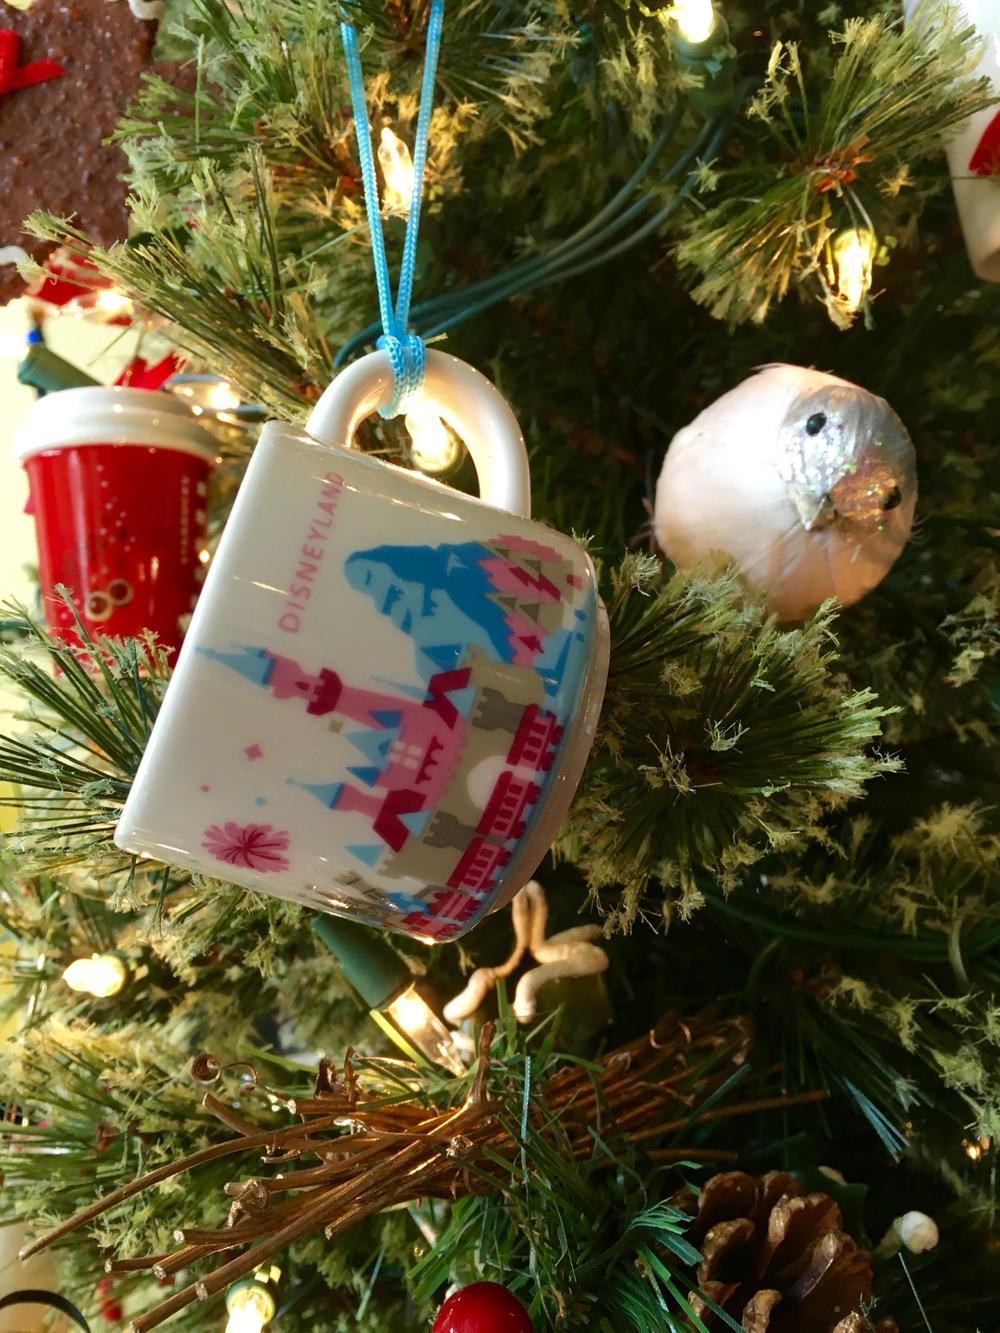 12 days of disney christmas day 12 starbucks disney ornaments